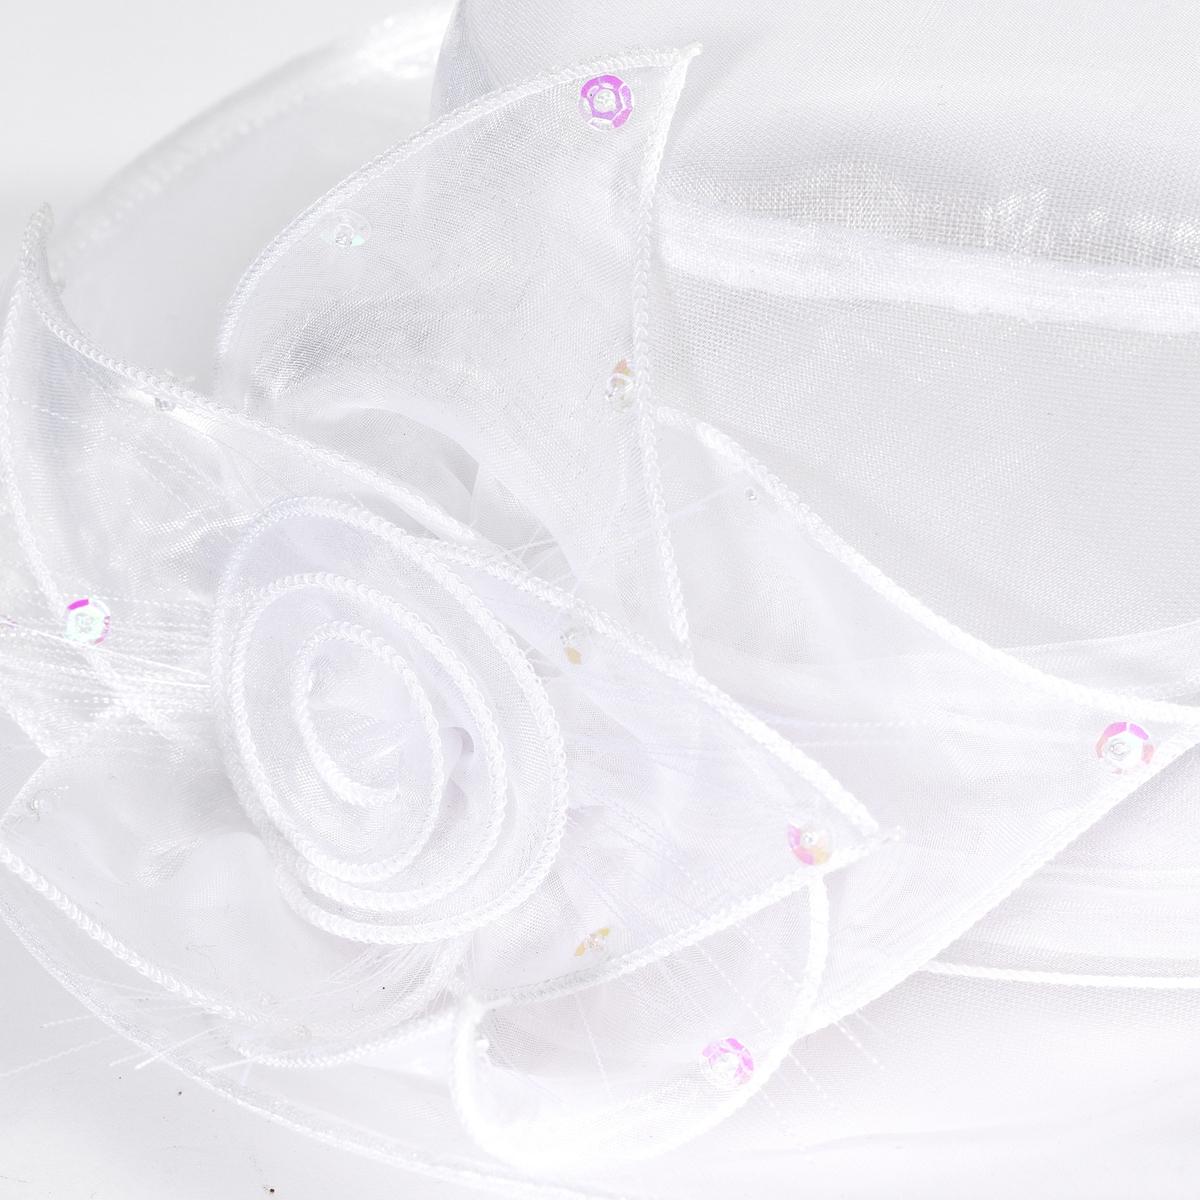 Шляпа для церемонийШляпа для церемоний. Красивый цветок сбоку. 100% полиэстера.<br><br>Цвет: белый